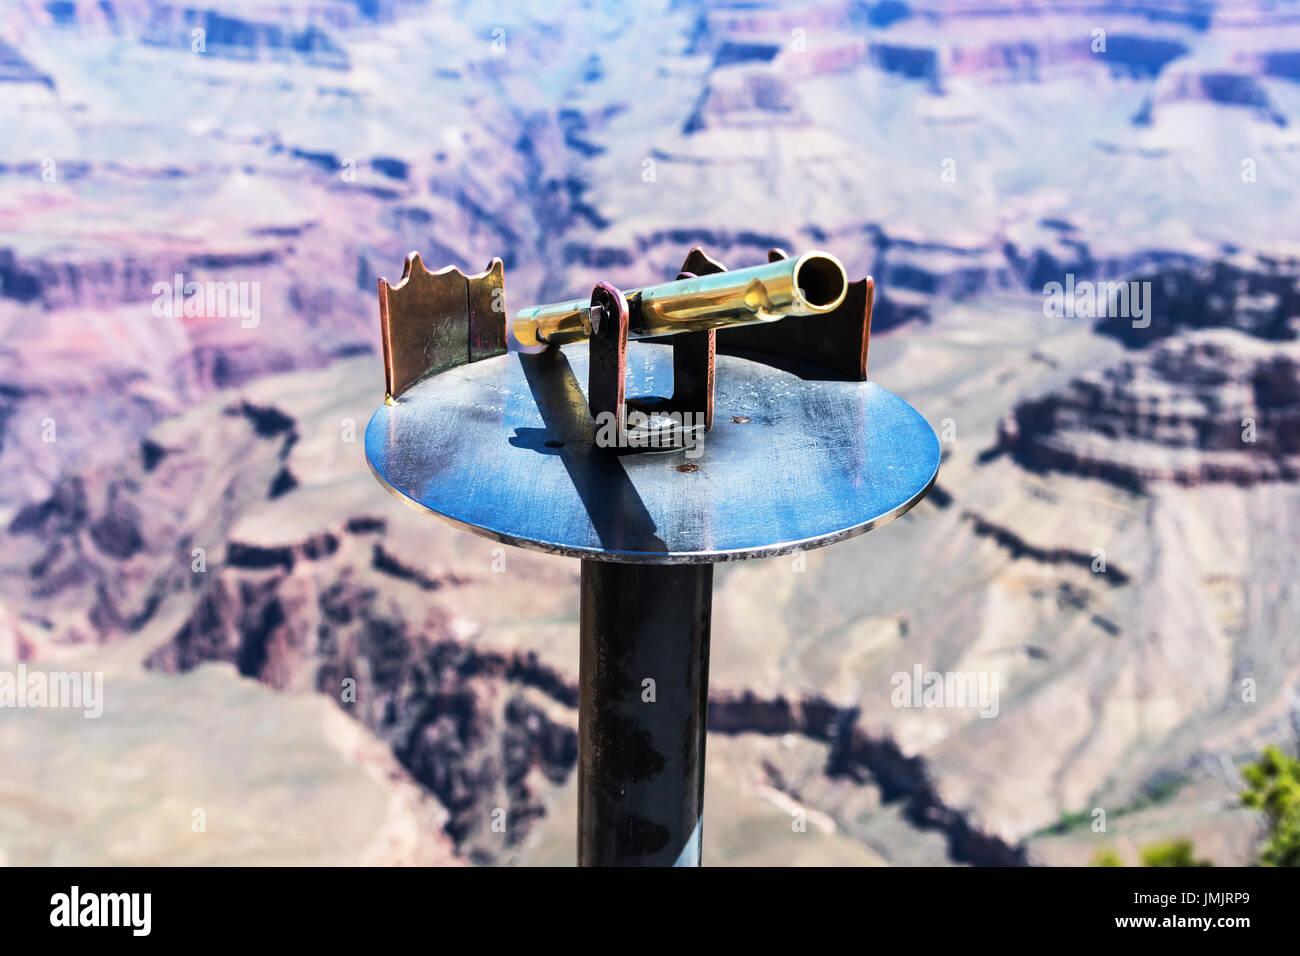 Optical device on a viewing platform,  Grand Canyon National Park,   Arizona, USA - Stock Image